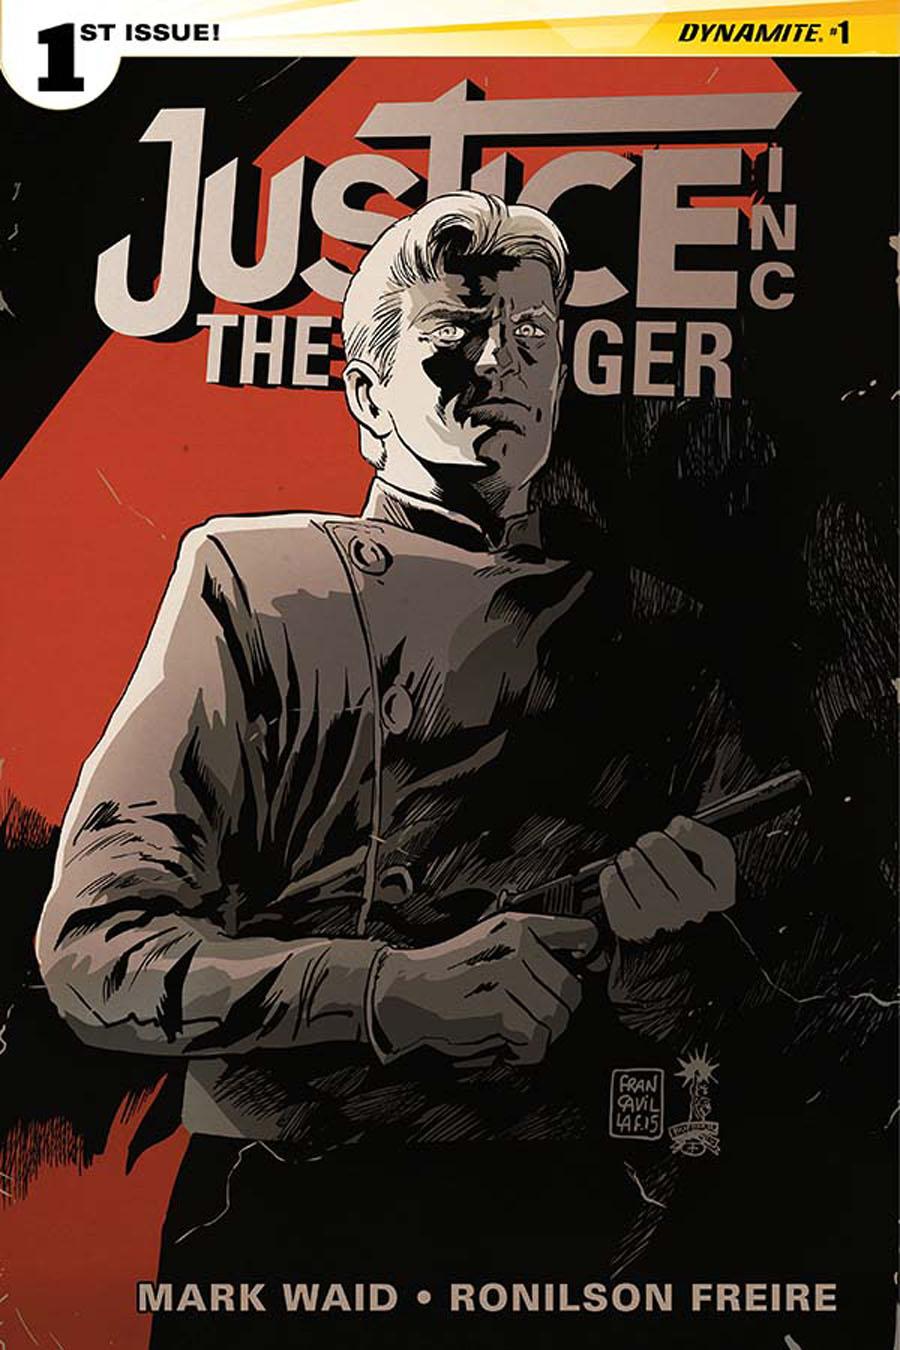 Justice Inc The Avenger #1 Cover C Regular Francesco Francavilla Cover